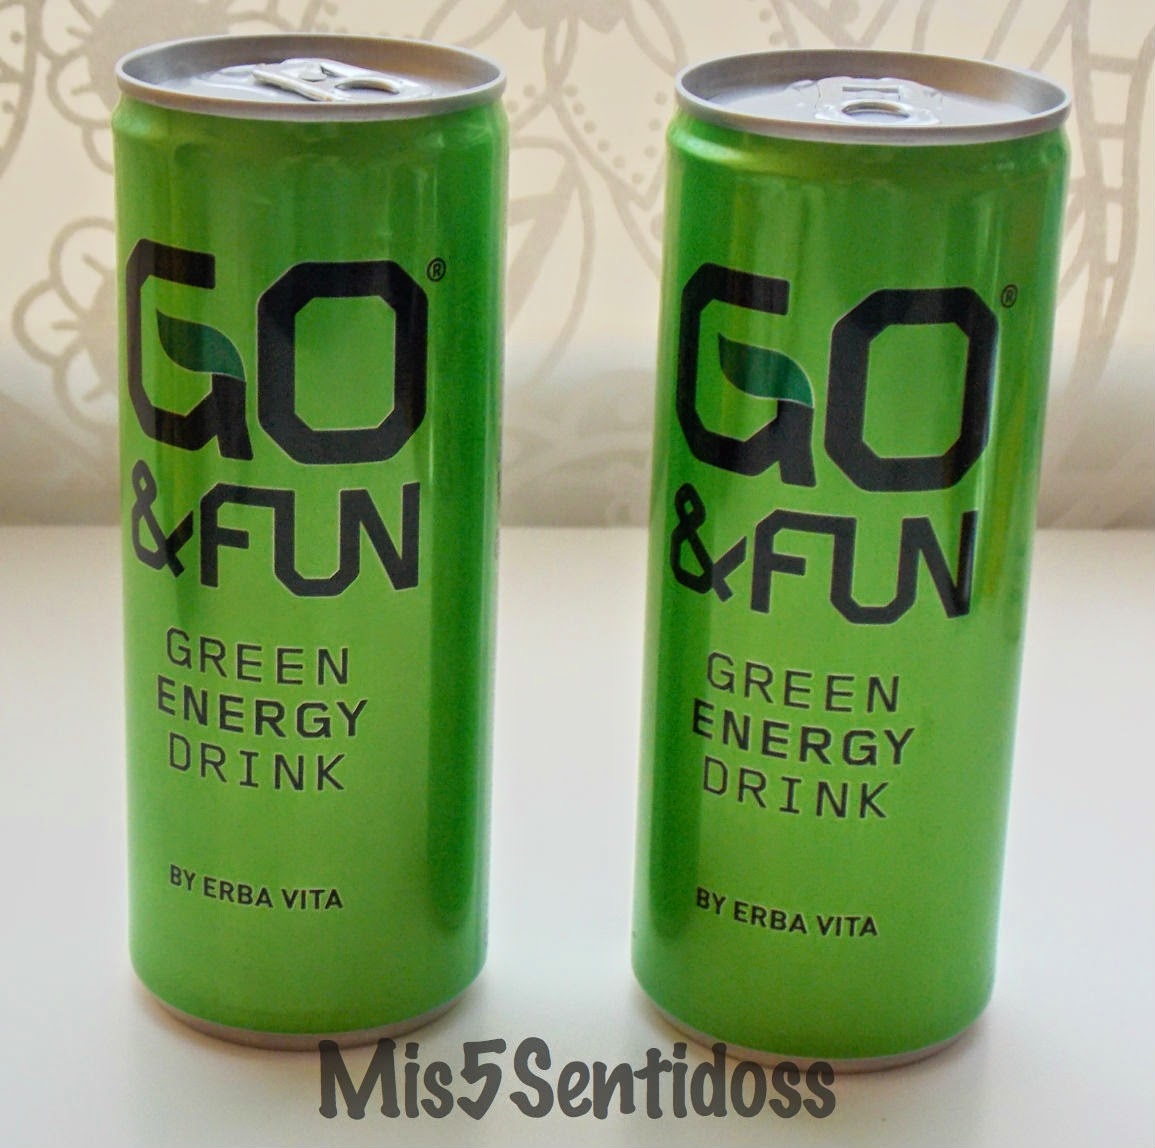 Degustabox Abril 2014 go&fun bebida energética